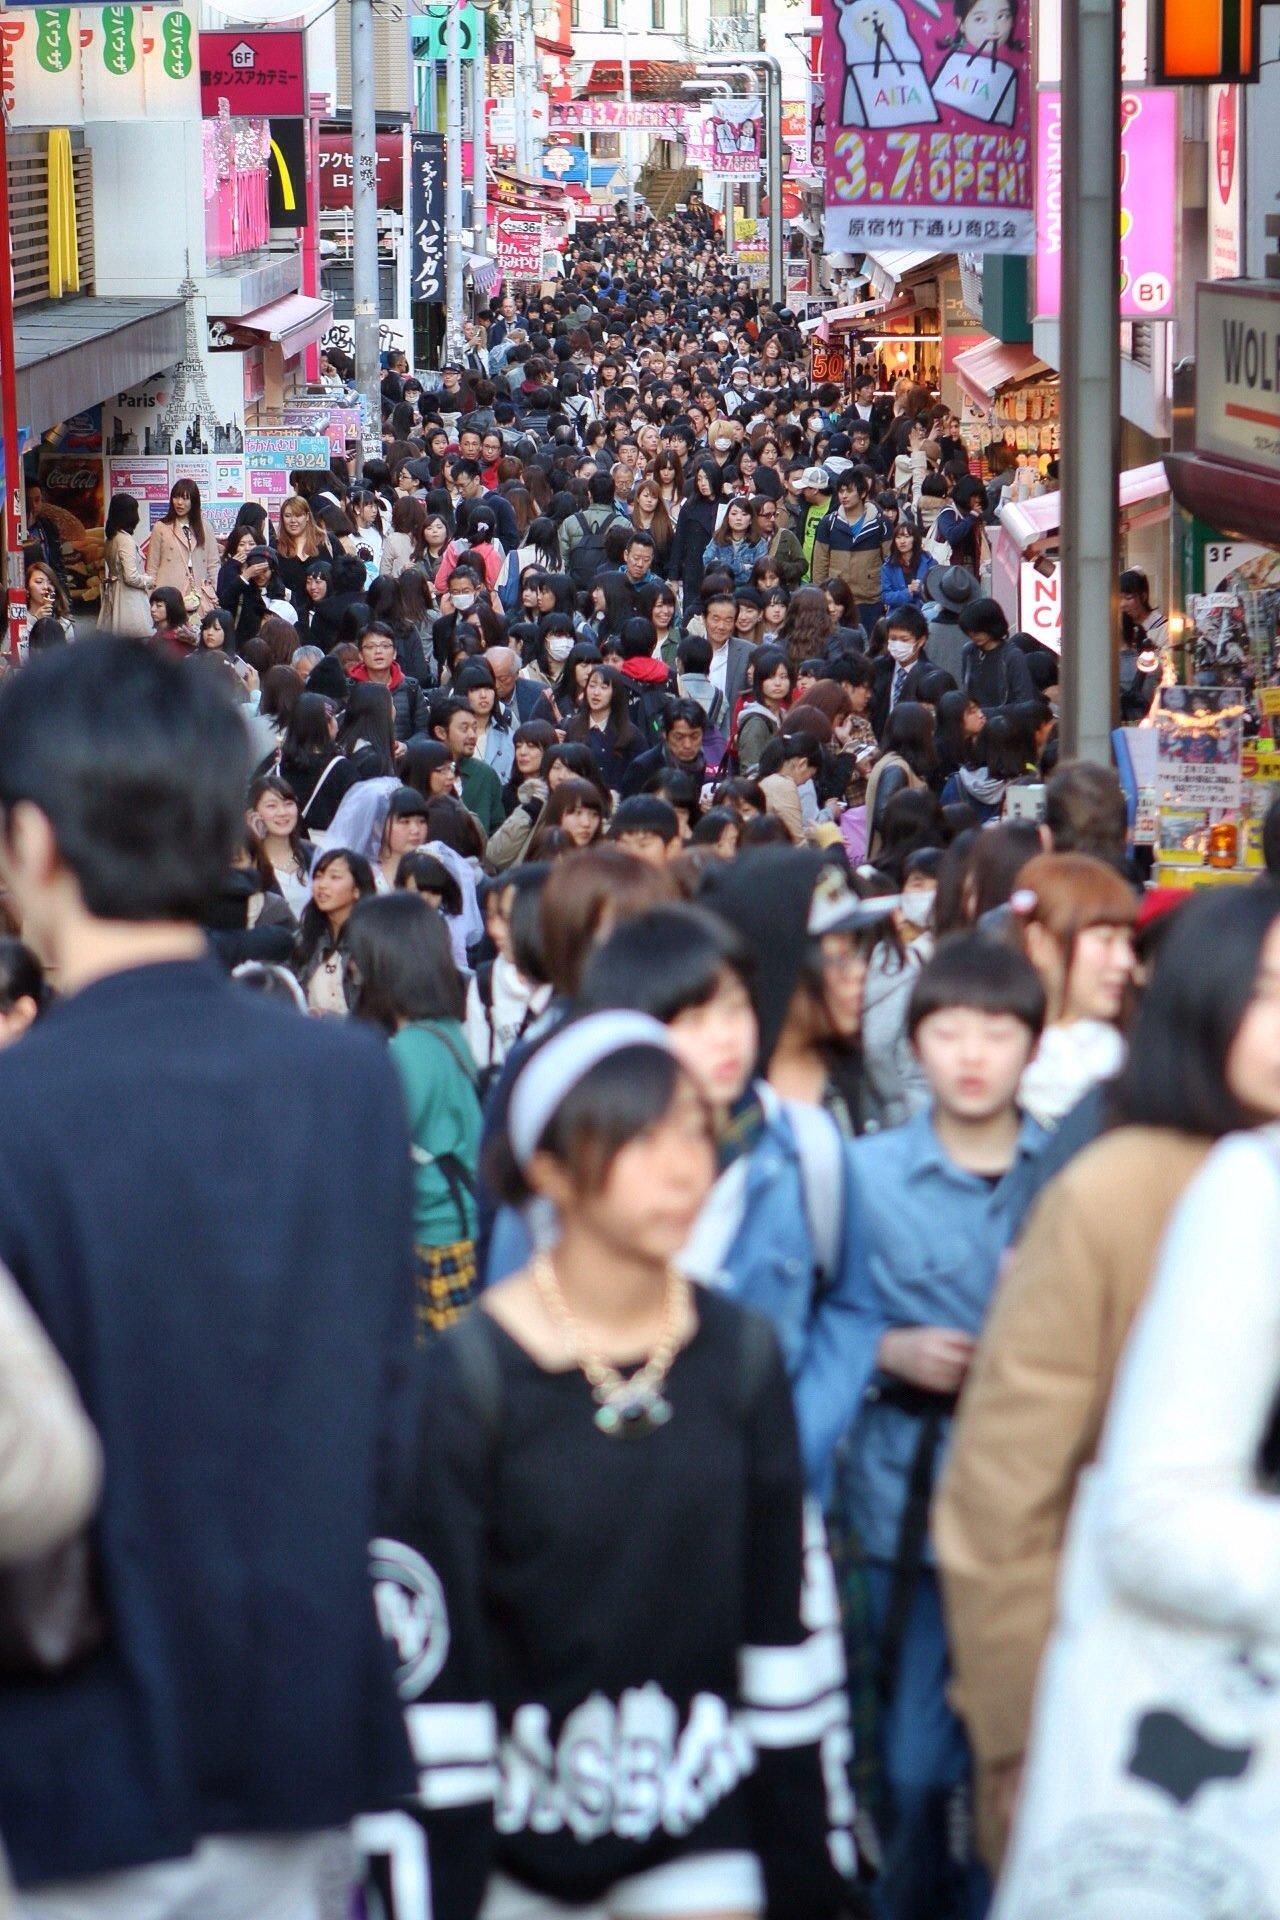 harajuku-tokyo-mass-people-kasuma-photography-blog